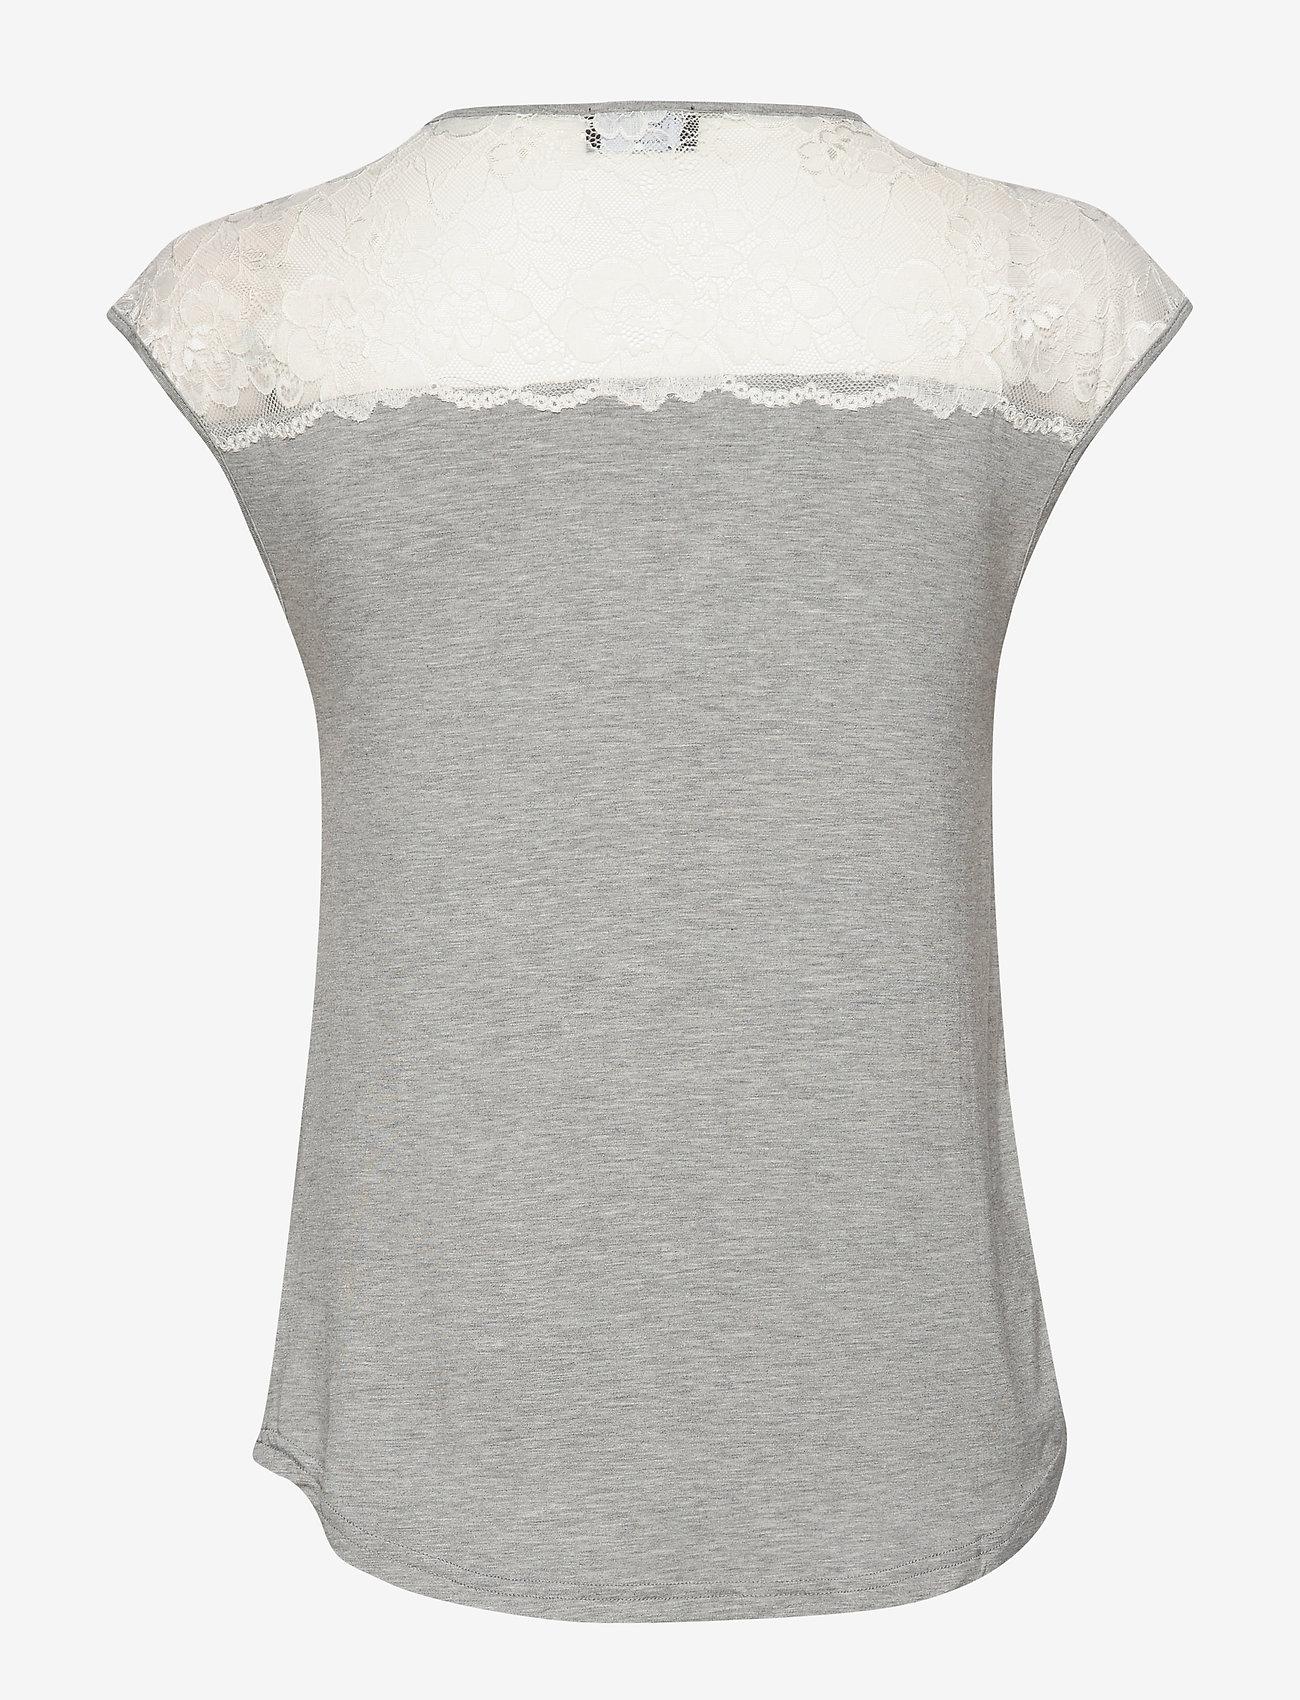 T-shirt Ss (Light Grey Melange W/ivory) (29.50 €) - Rosemunde BAXVh